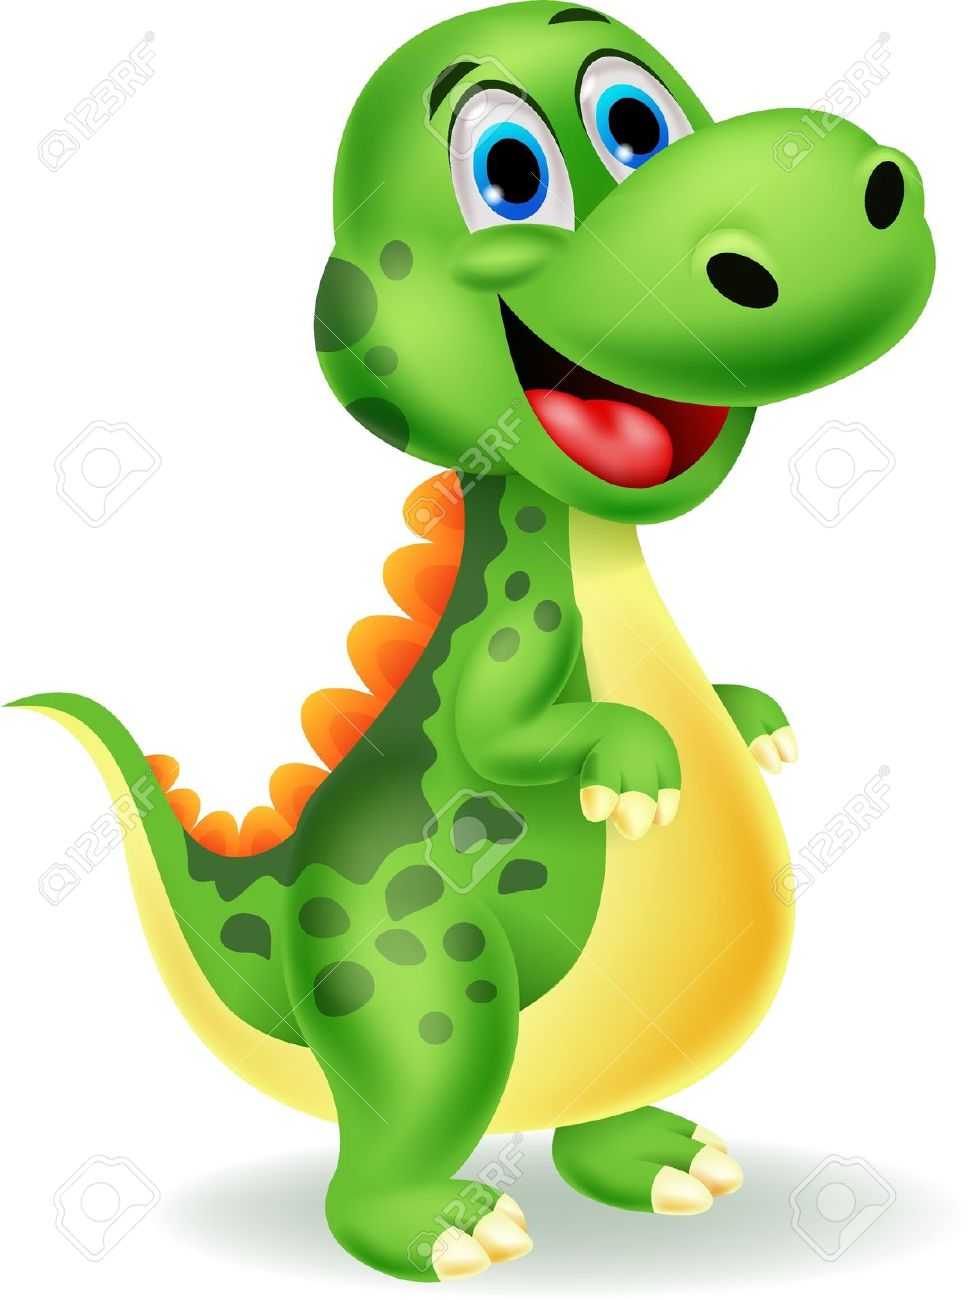 Bonito Dos Desenhos Animados De Dinossauros Royalty Free Cliparts